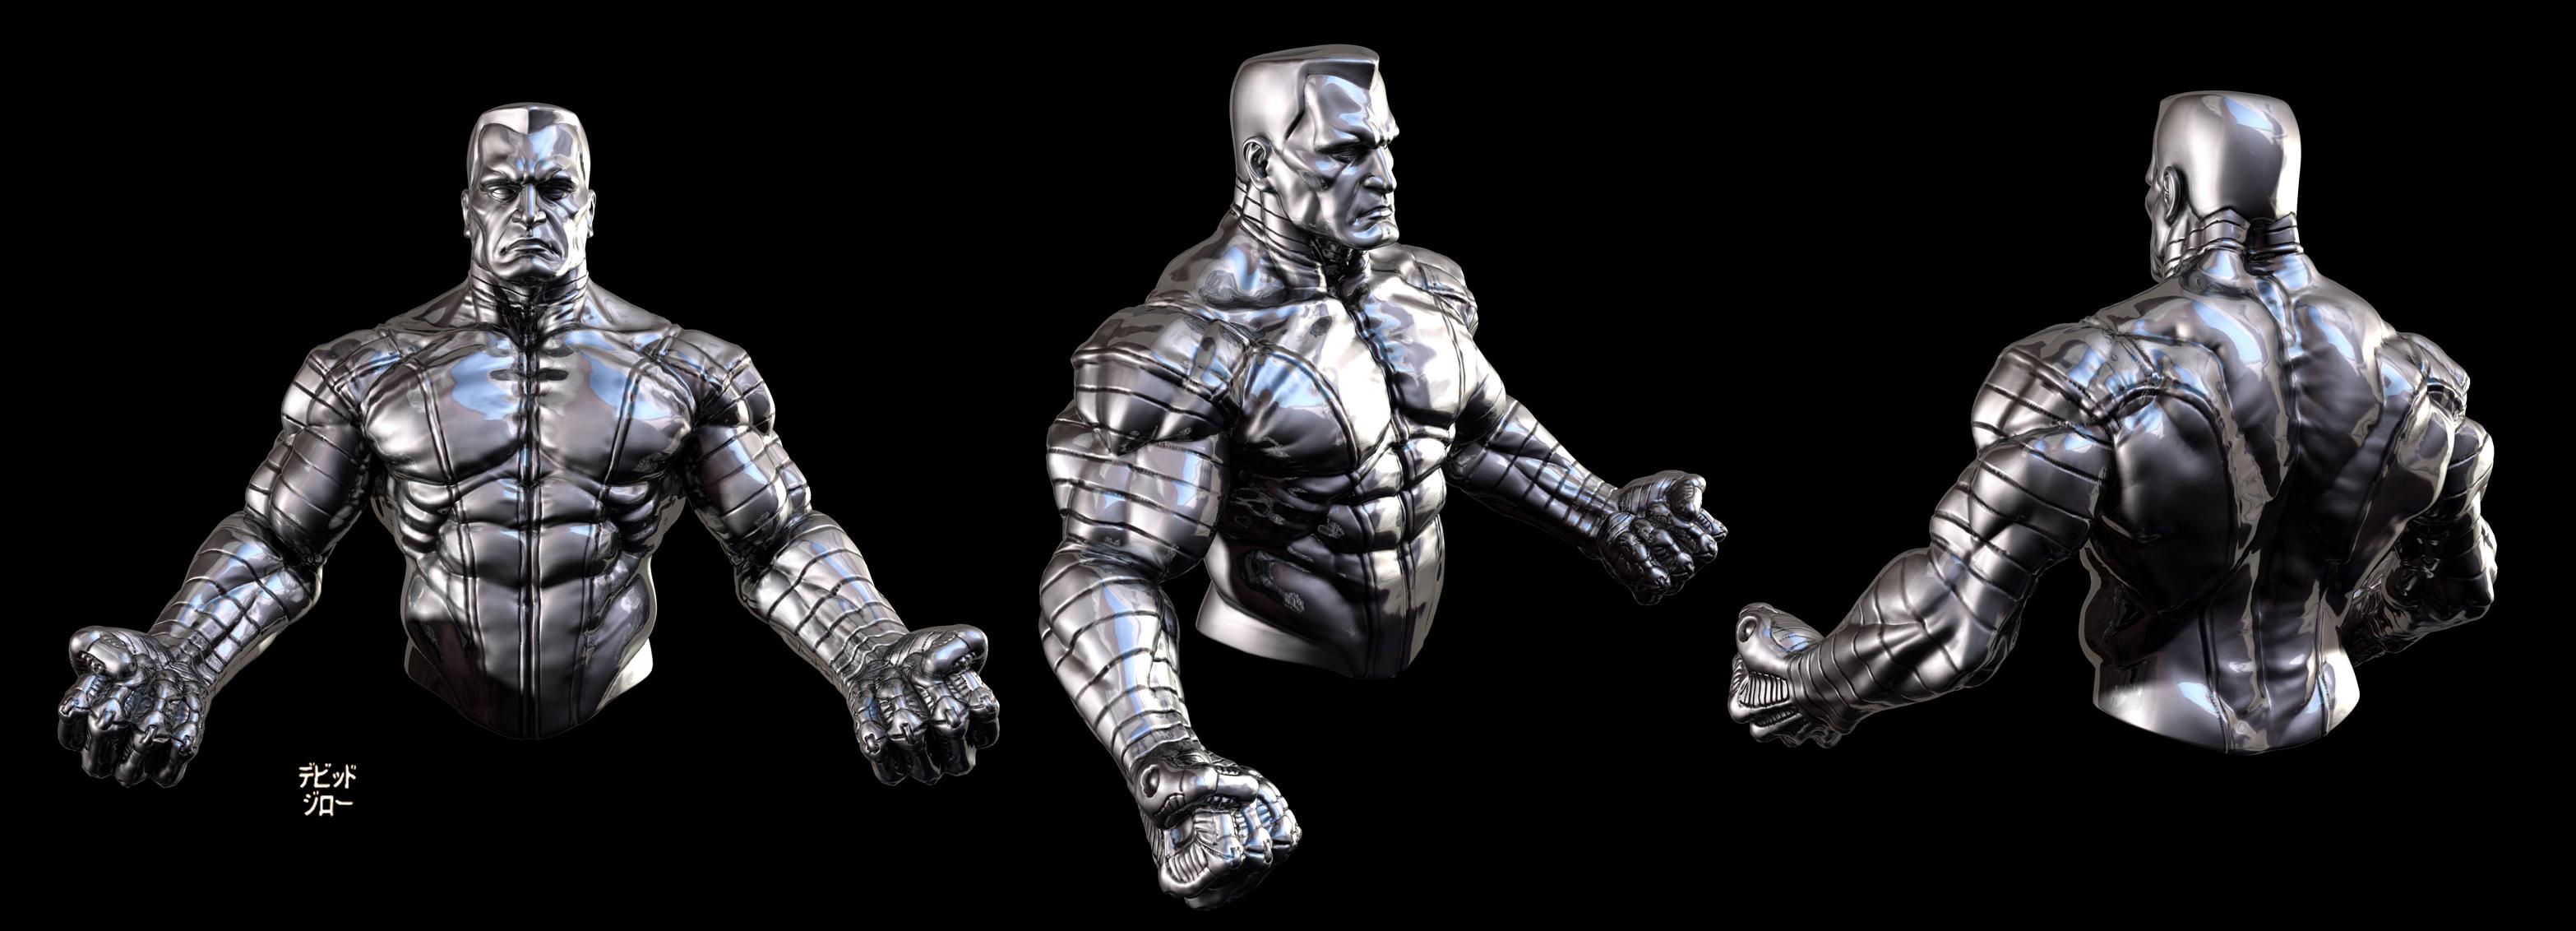 Marvel Colossus Wallpaper - WallpaperSafari X Men The Last Stand Colossus